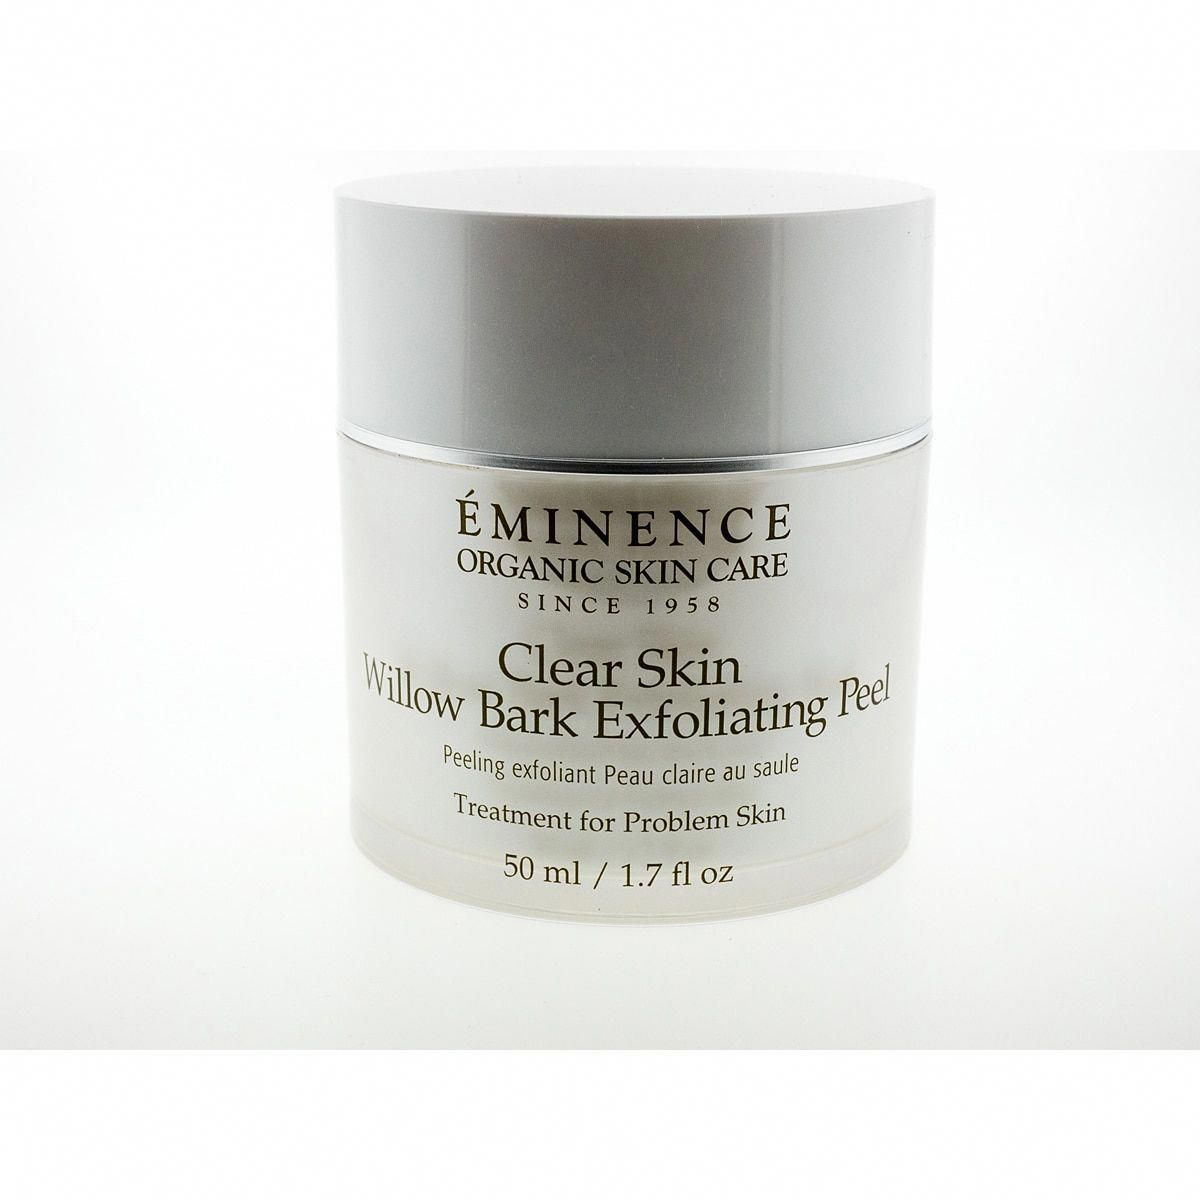 Eminence 1 7 Ounce Clear Skin Willow Bark Exfoliating Peel Saggytummyskinafterbaby In 2020 Exfoliating Peel Clear Skin Peeling Skin